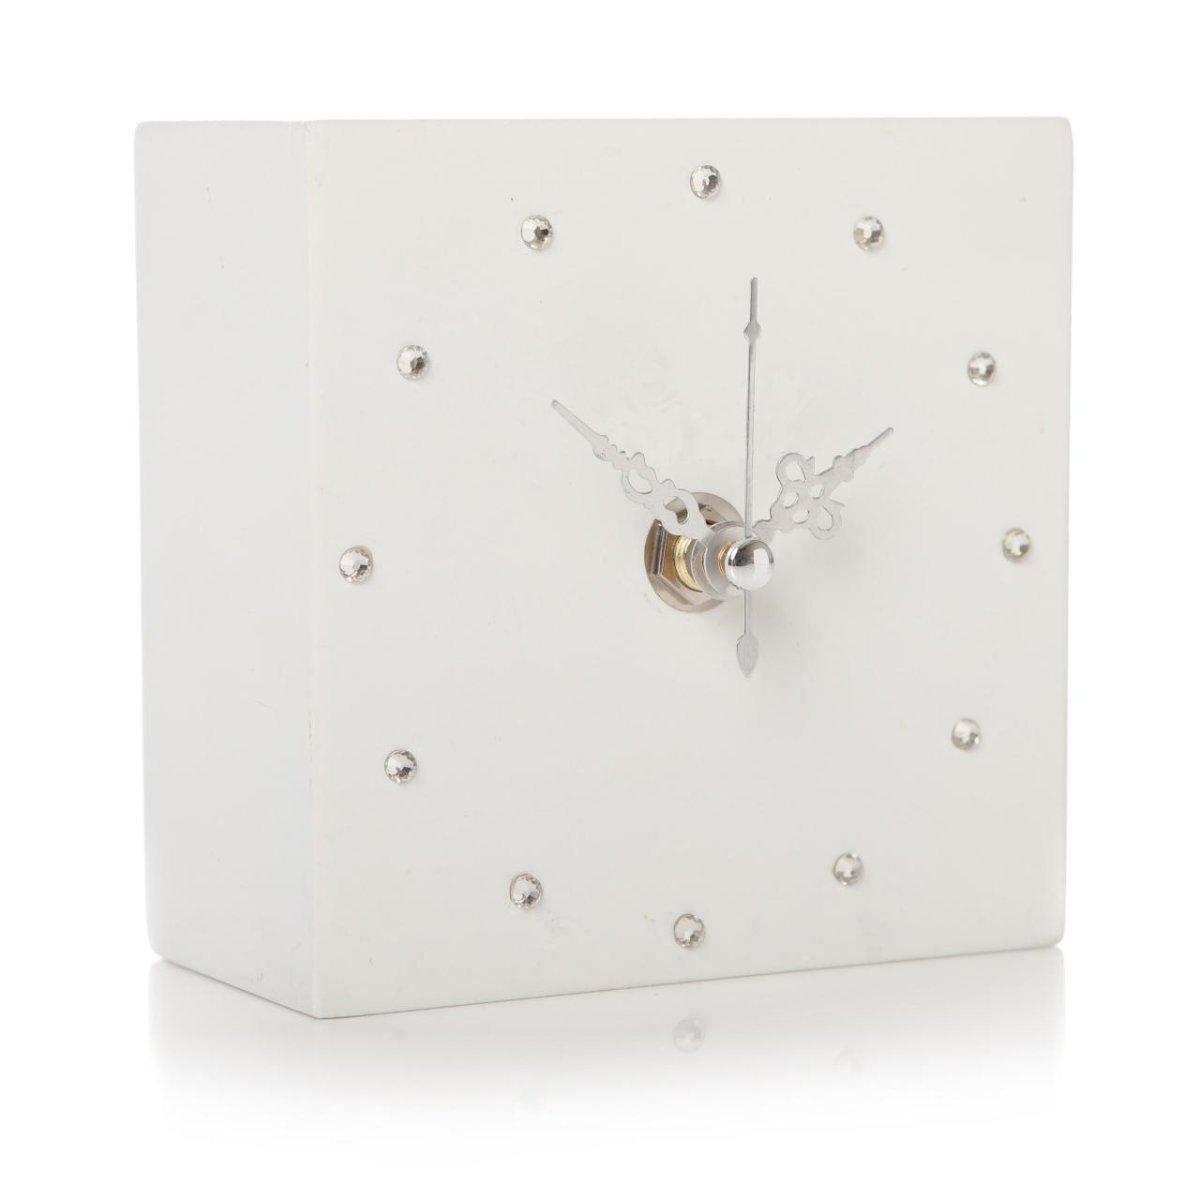 Glamorous Shruti Gem Crystal Cube Shelf Mantel Clock - Various Colours (Dark Blue)